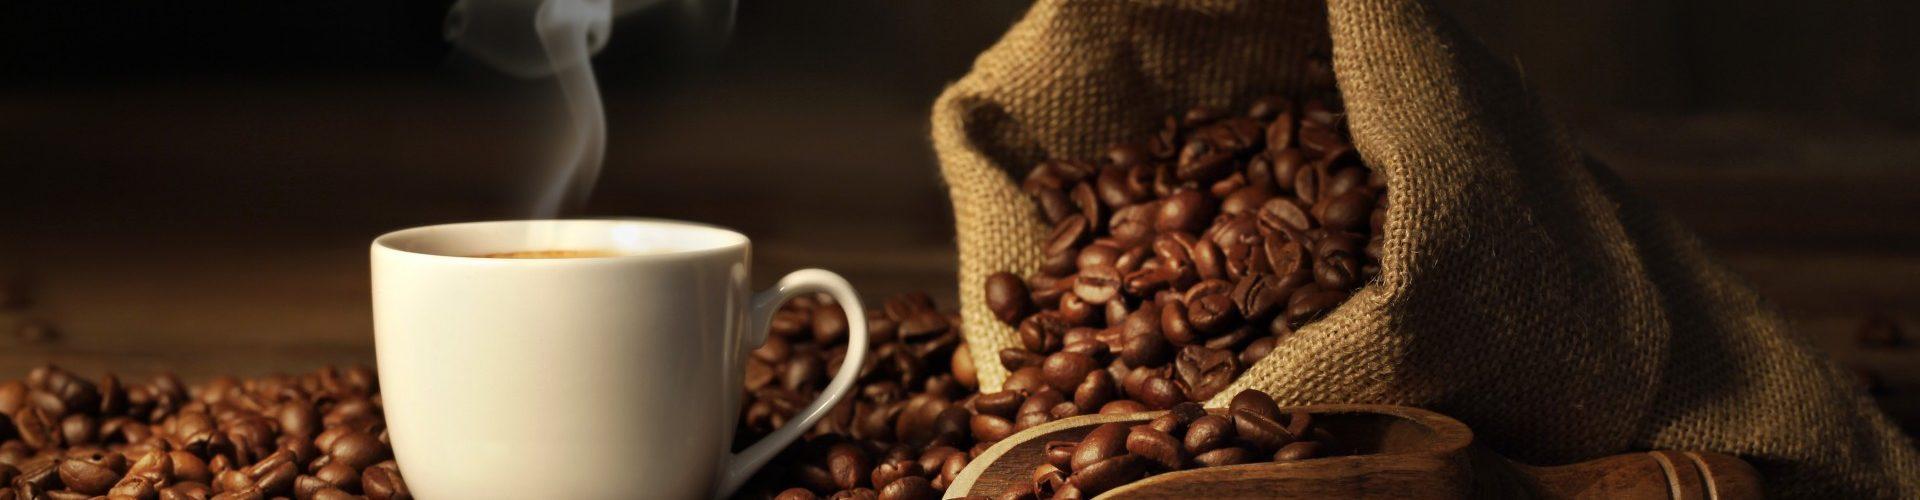 Coffee Service Leads